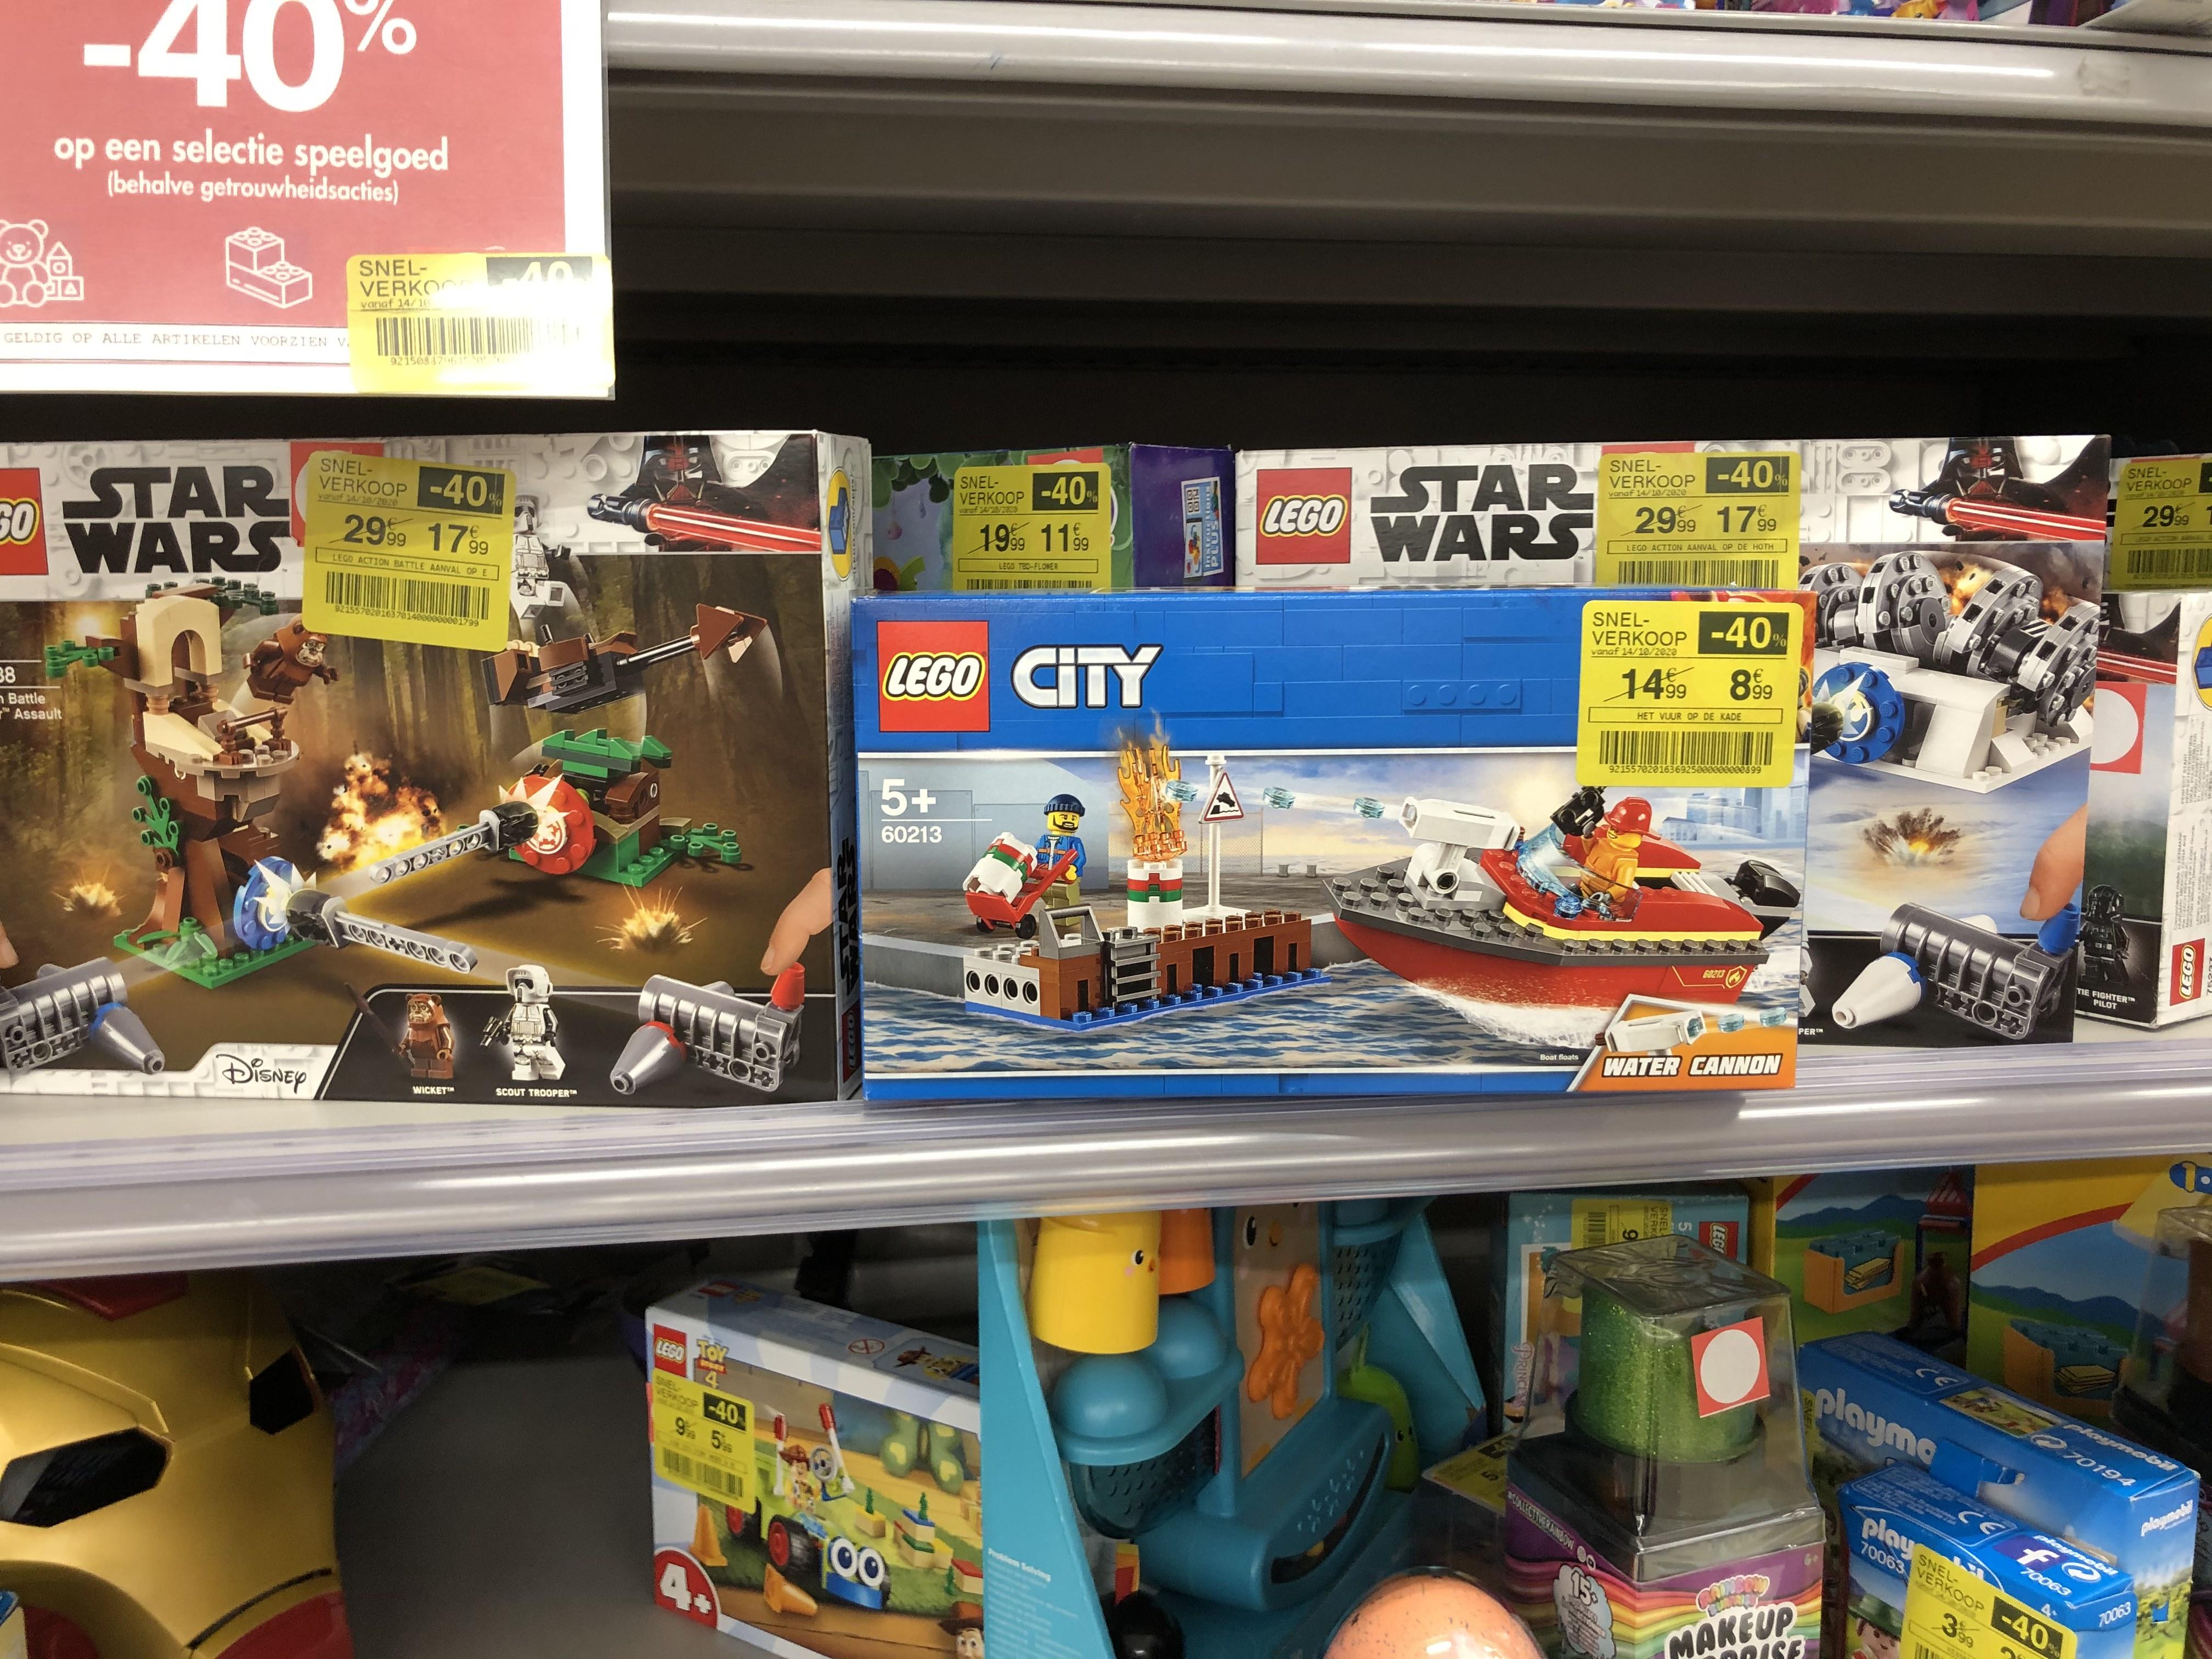 [Lokaal België Turnhout] Lego 40% korting @Carrefour hypermarkt